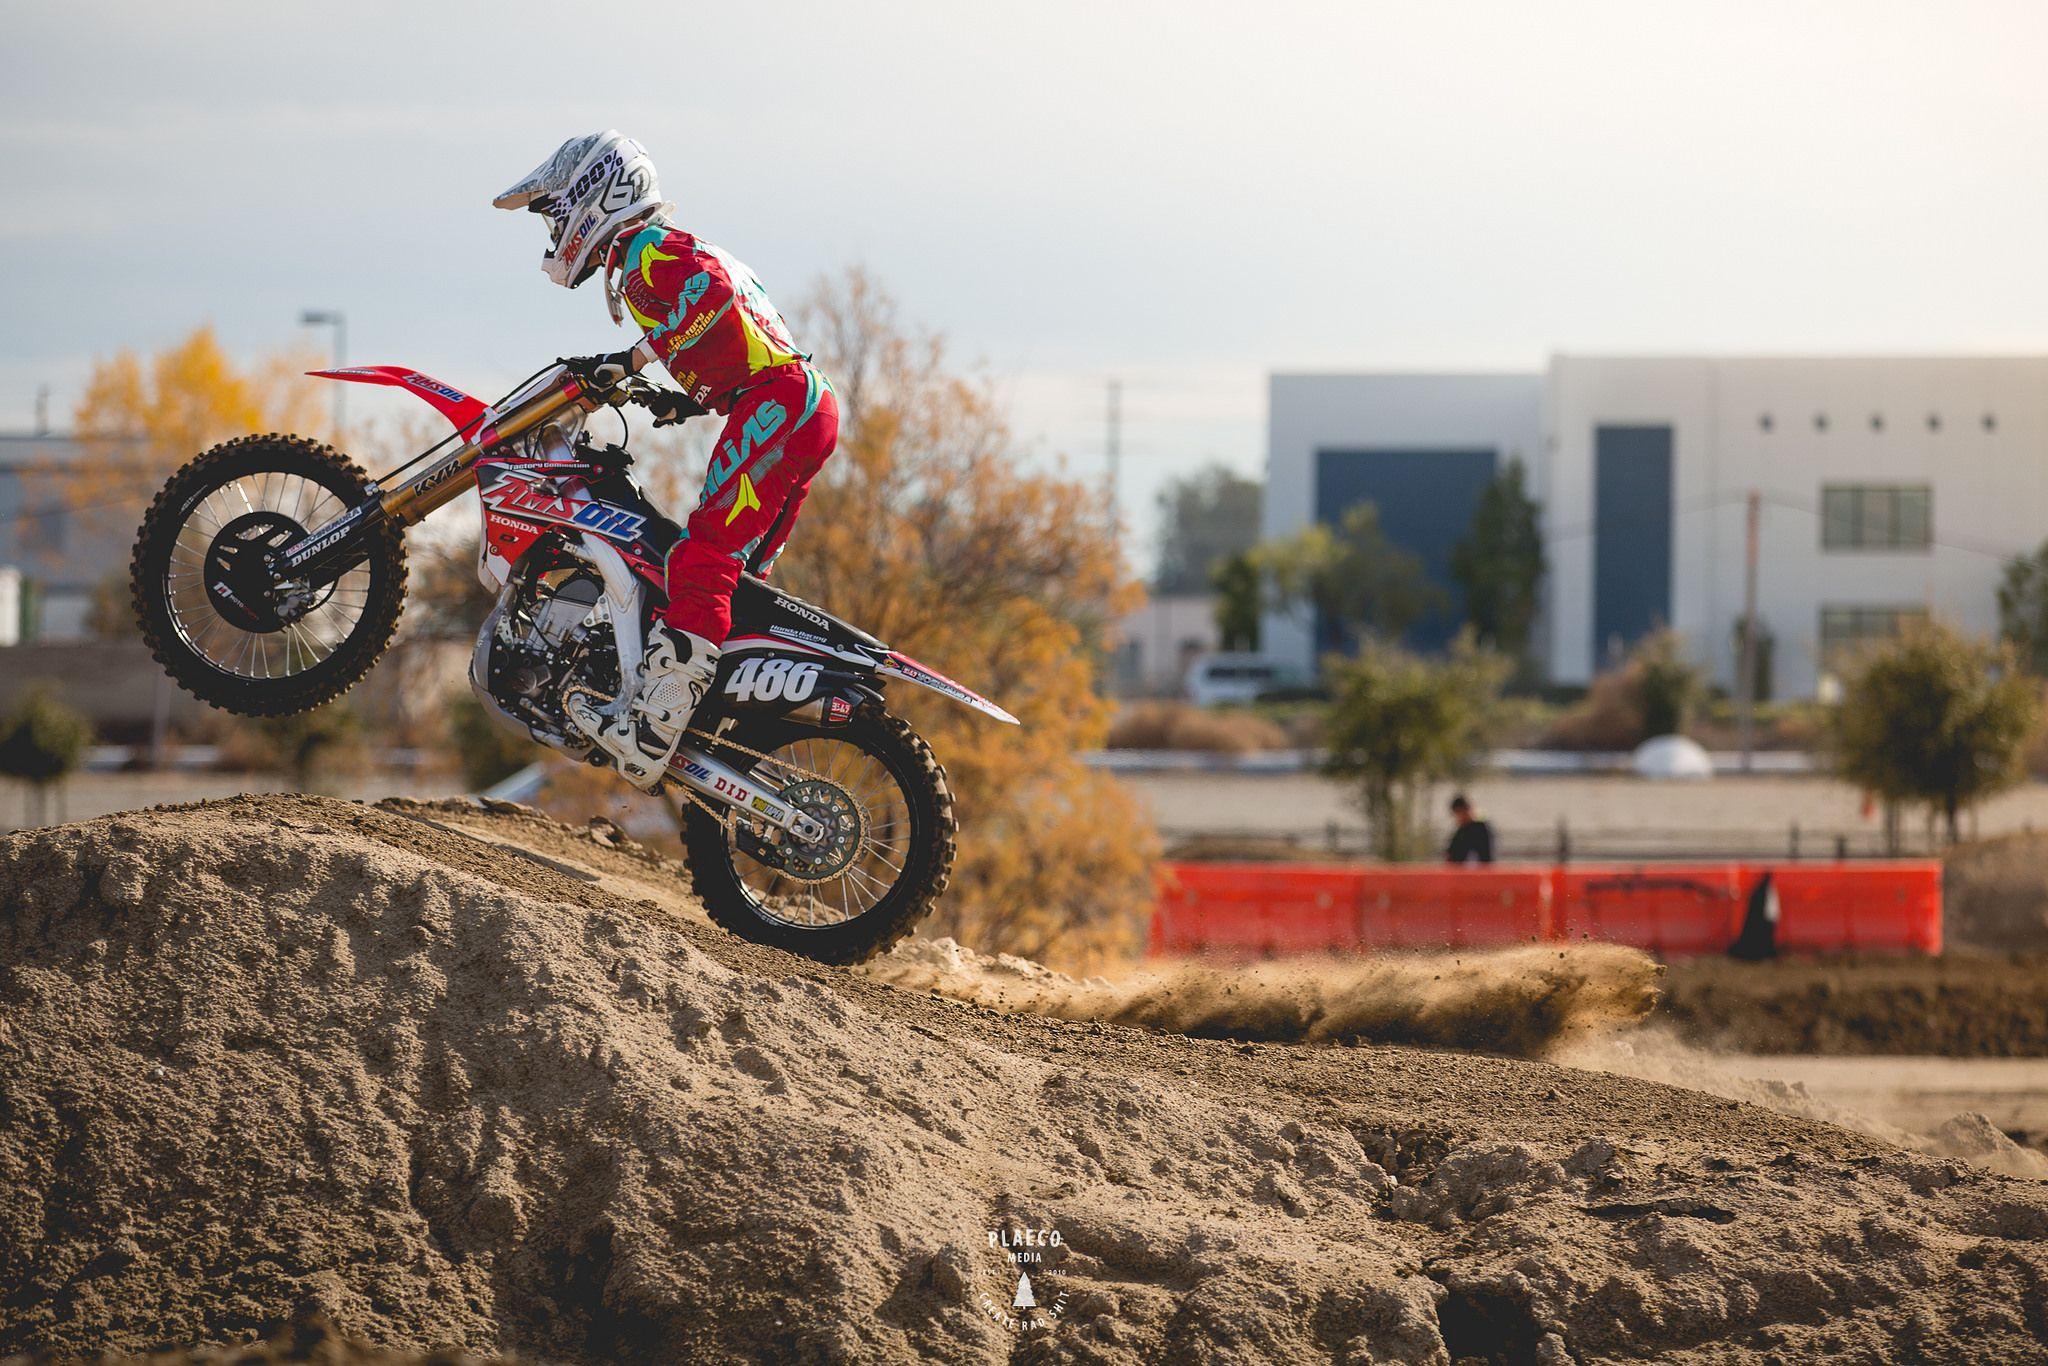 Chase Sexton Dirtbikes Motorcross Bike Life